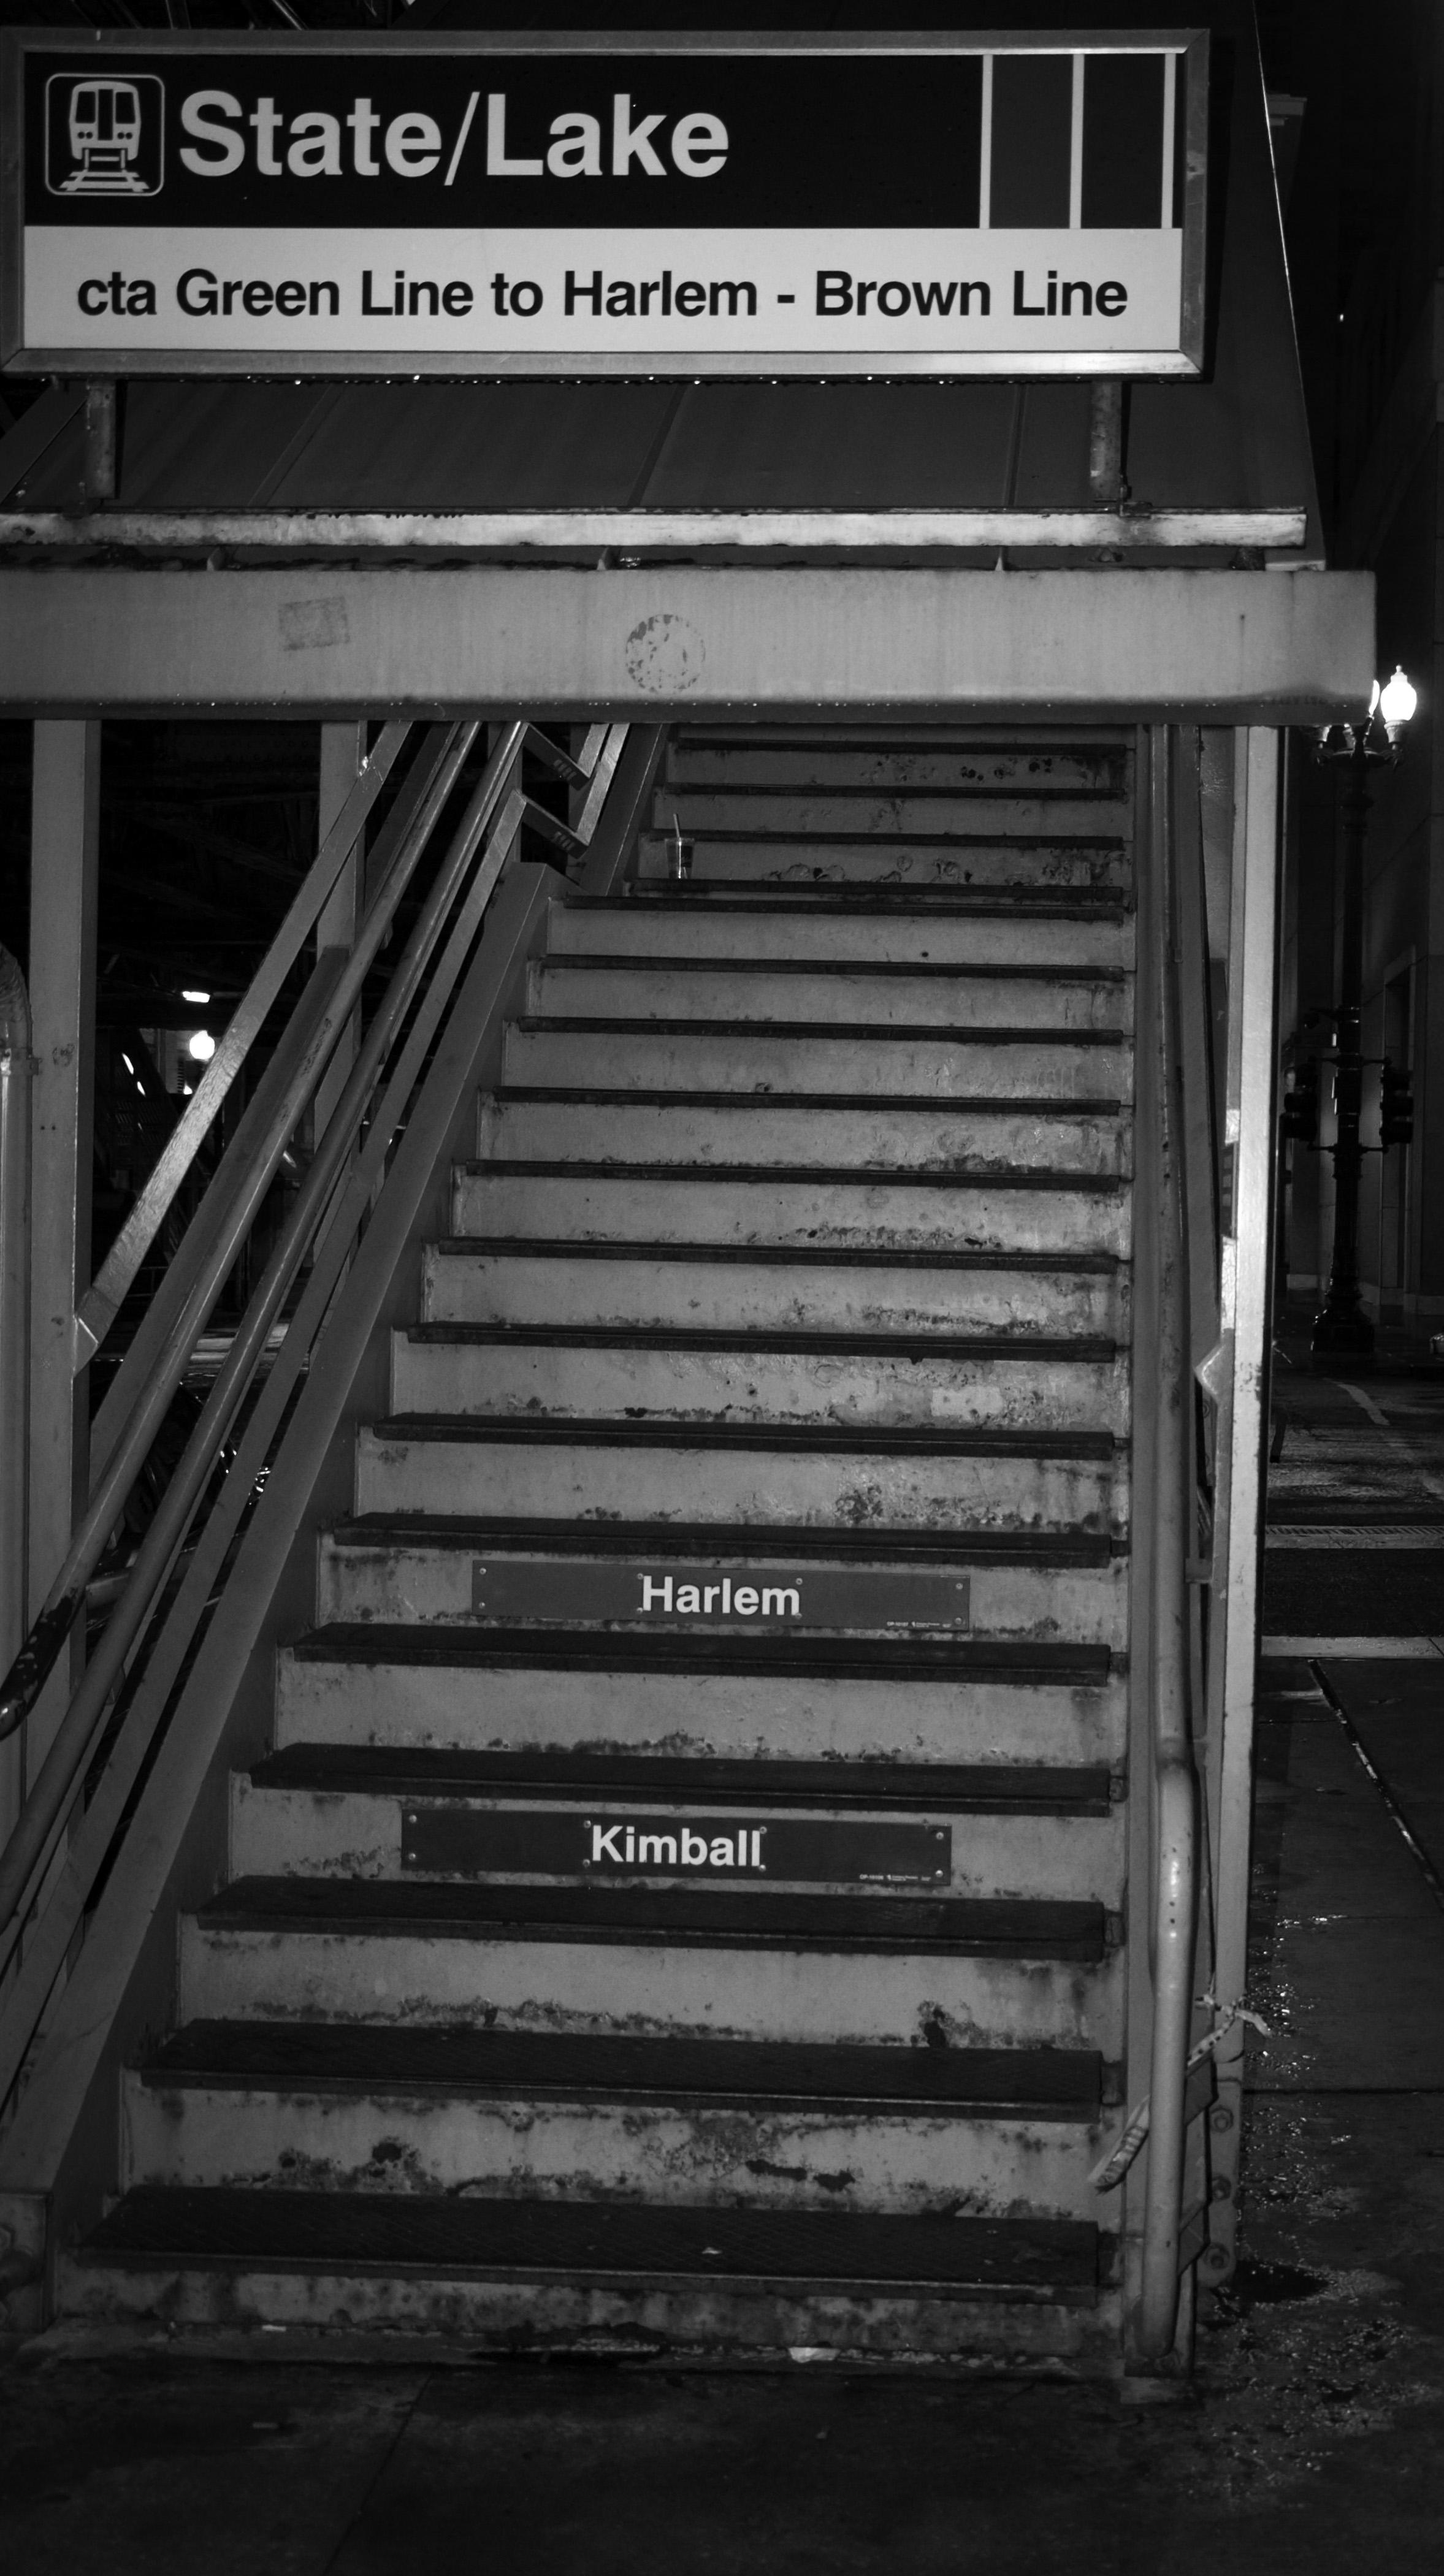 Go Harlem 2012 Chicago